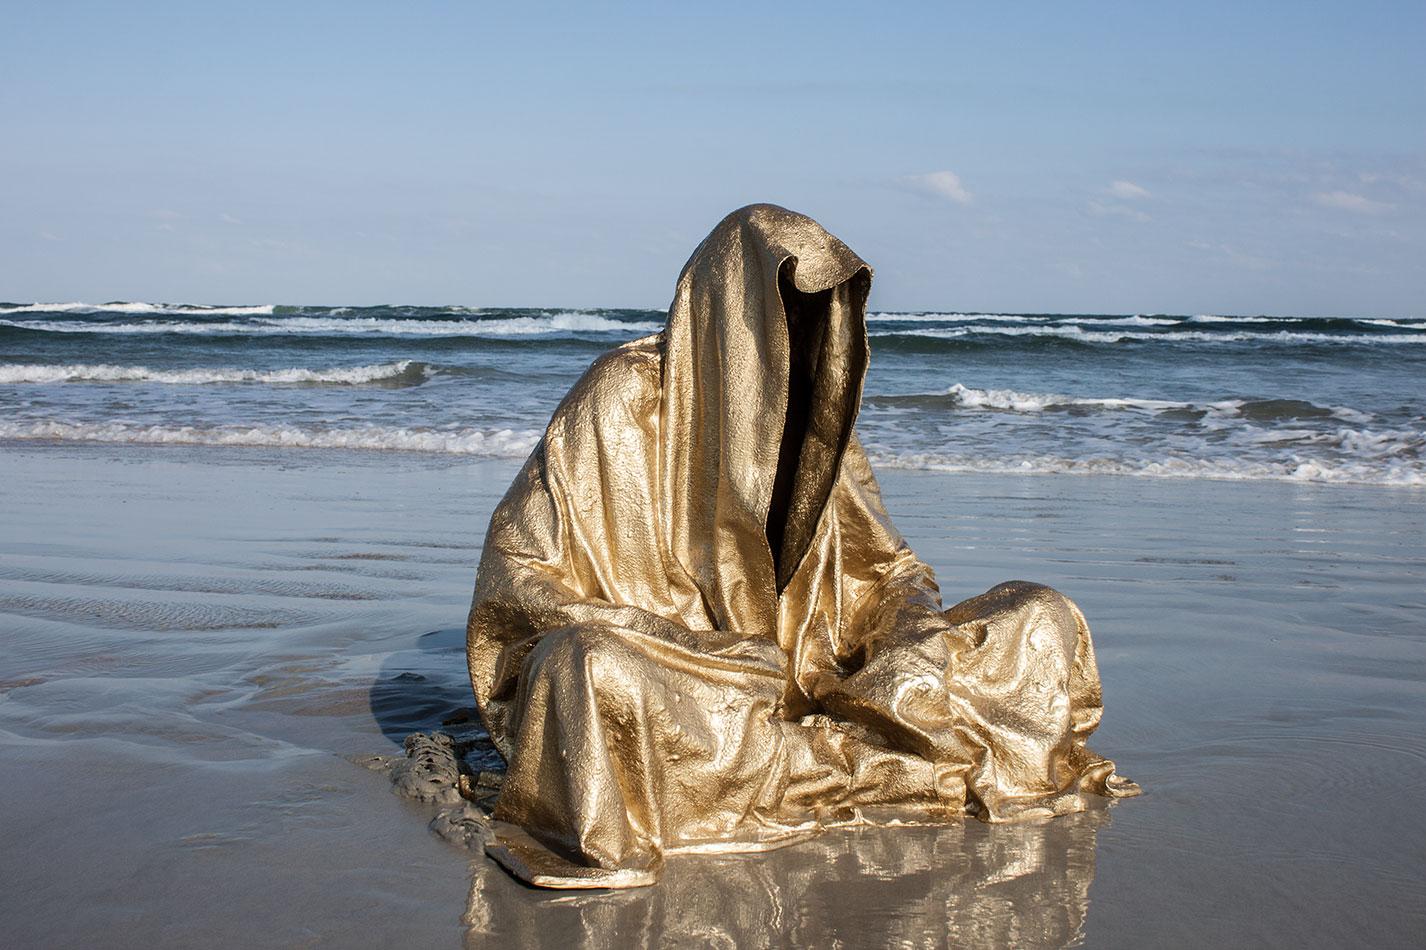 art-basel-miami-beach-fair-usa-florida-guardians-of-time-manfred-kili-kielnhofer-contemporary-fine-art-modern-arts-design-antiques-sculpture-5207